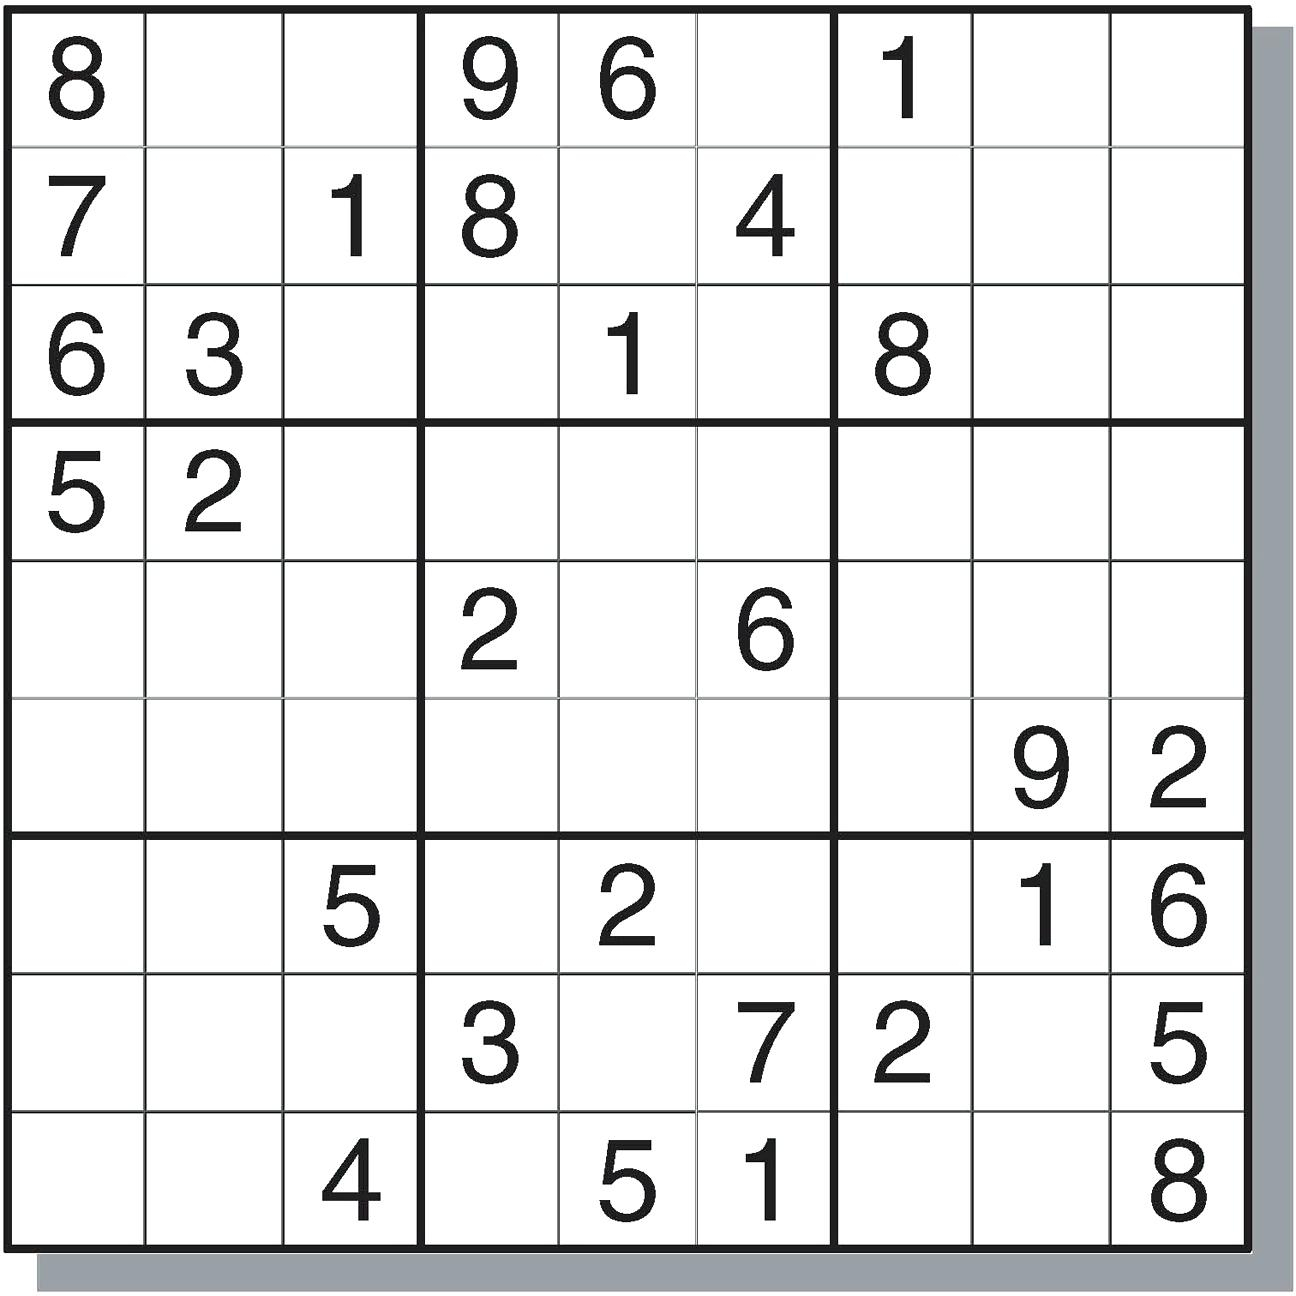 Sudoku Online - Ecosia - Download Printable Sudoku Puzzles Free